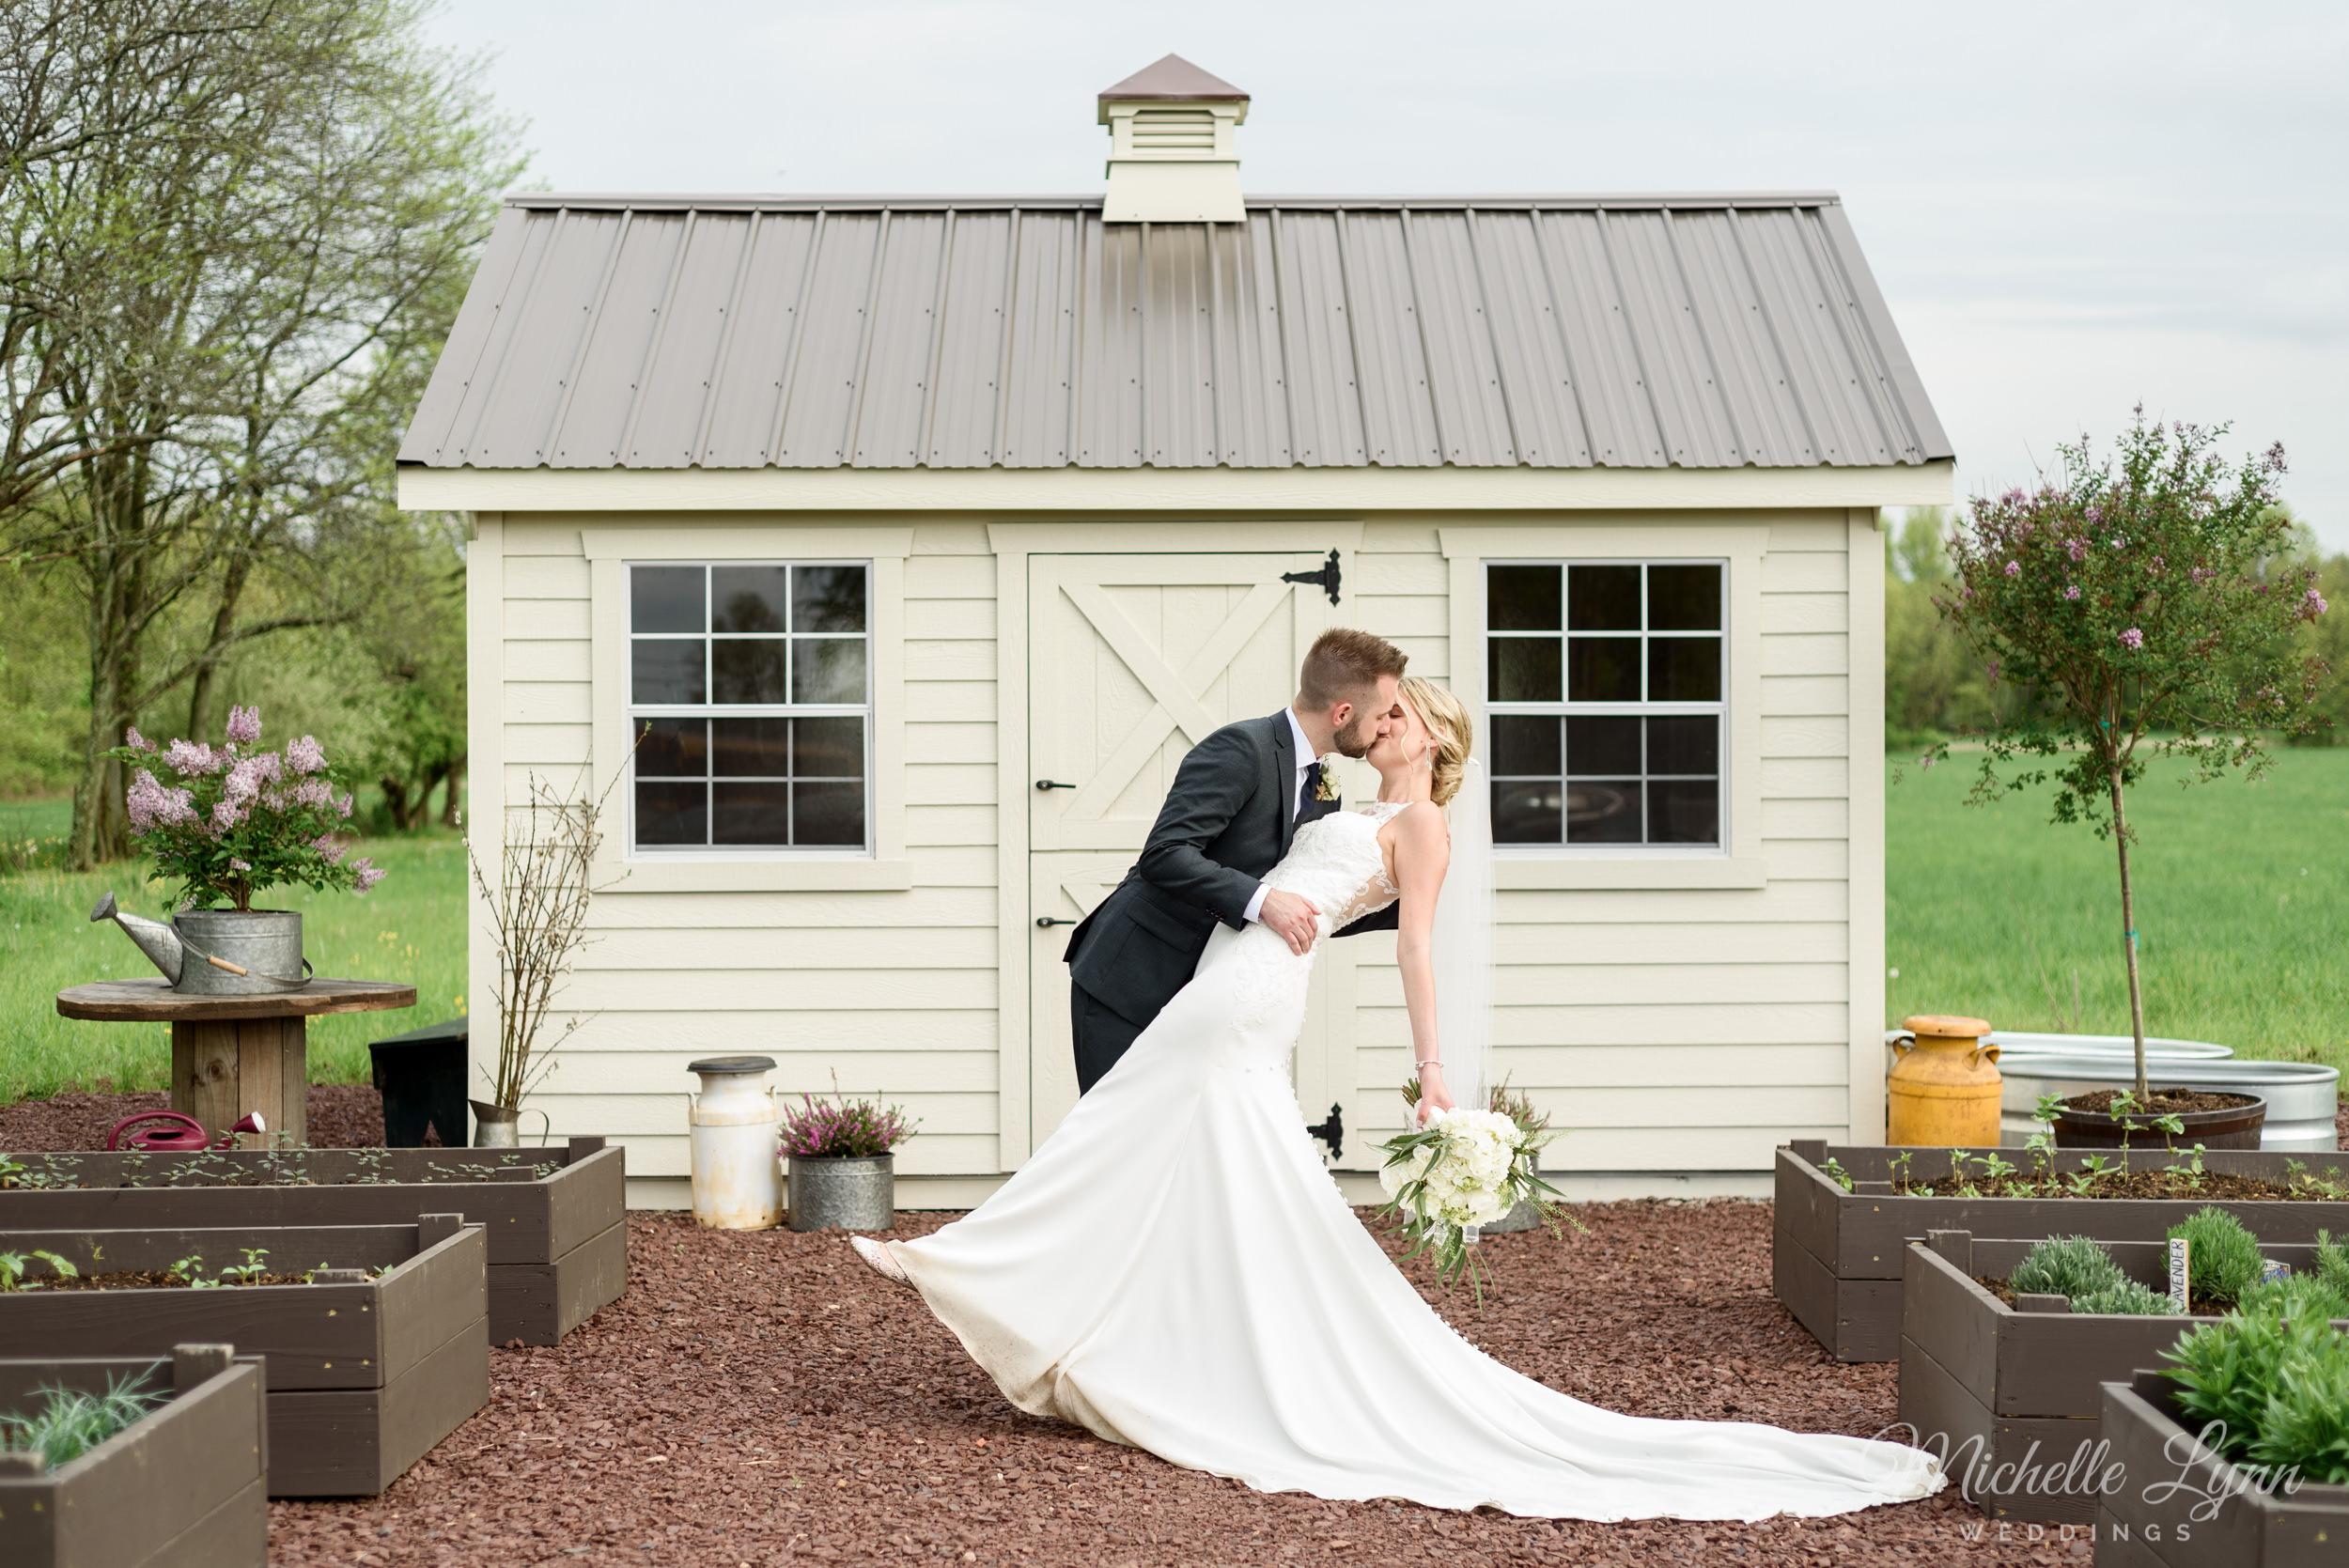 mlw-the-farm-bakery-and-events-wedding-photos-56.jpg